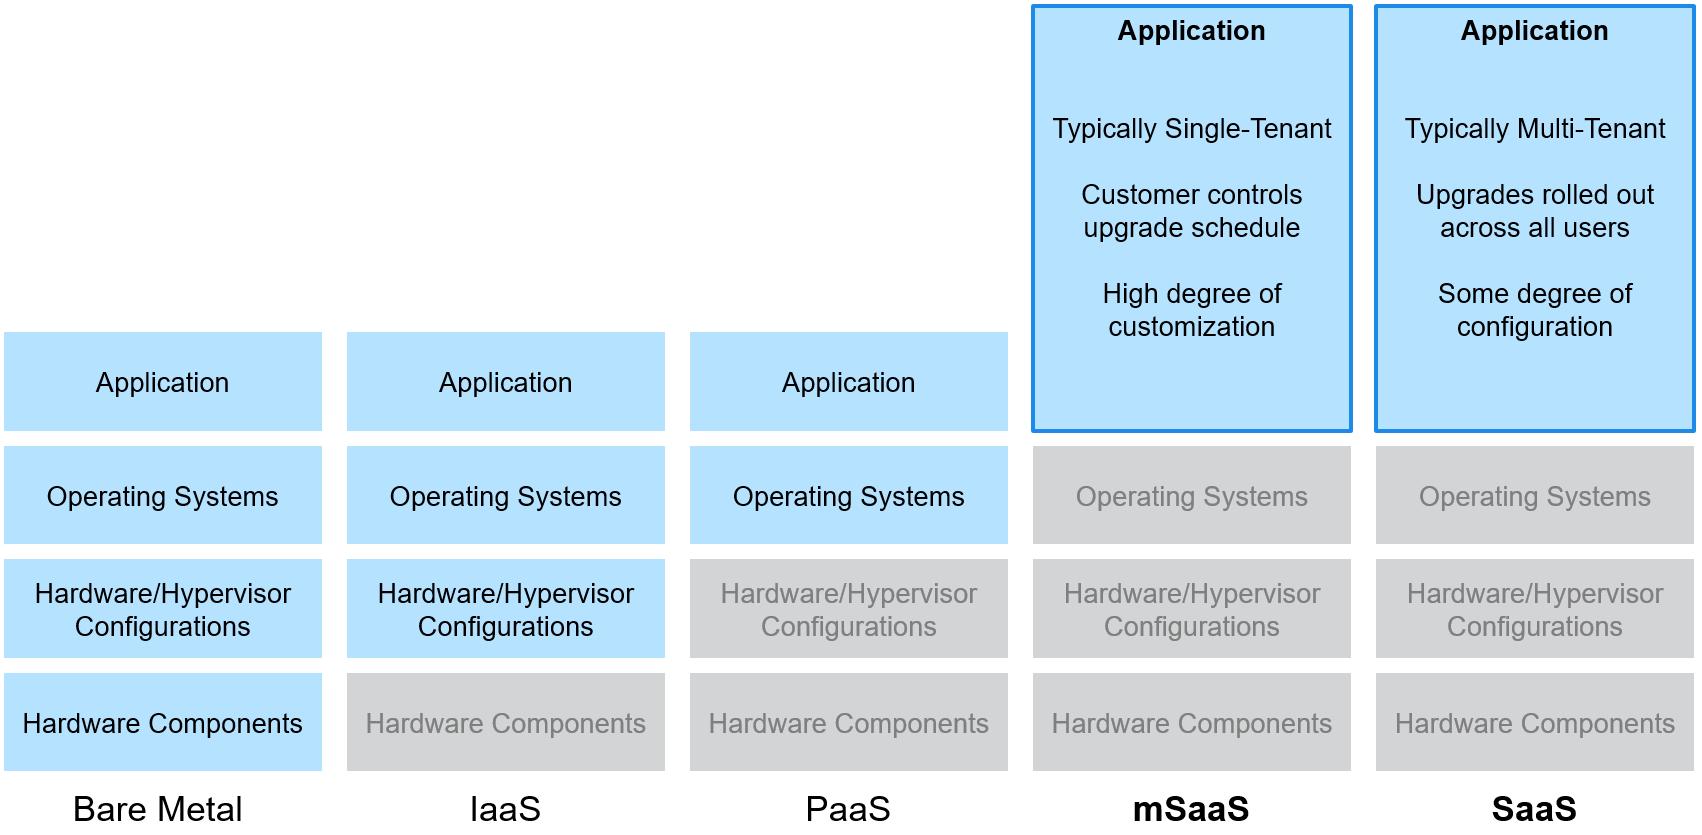 Cloud service types